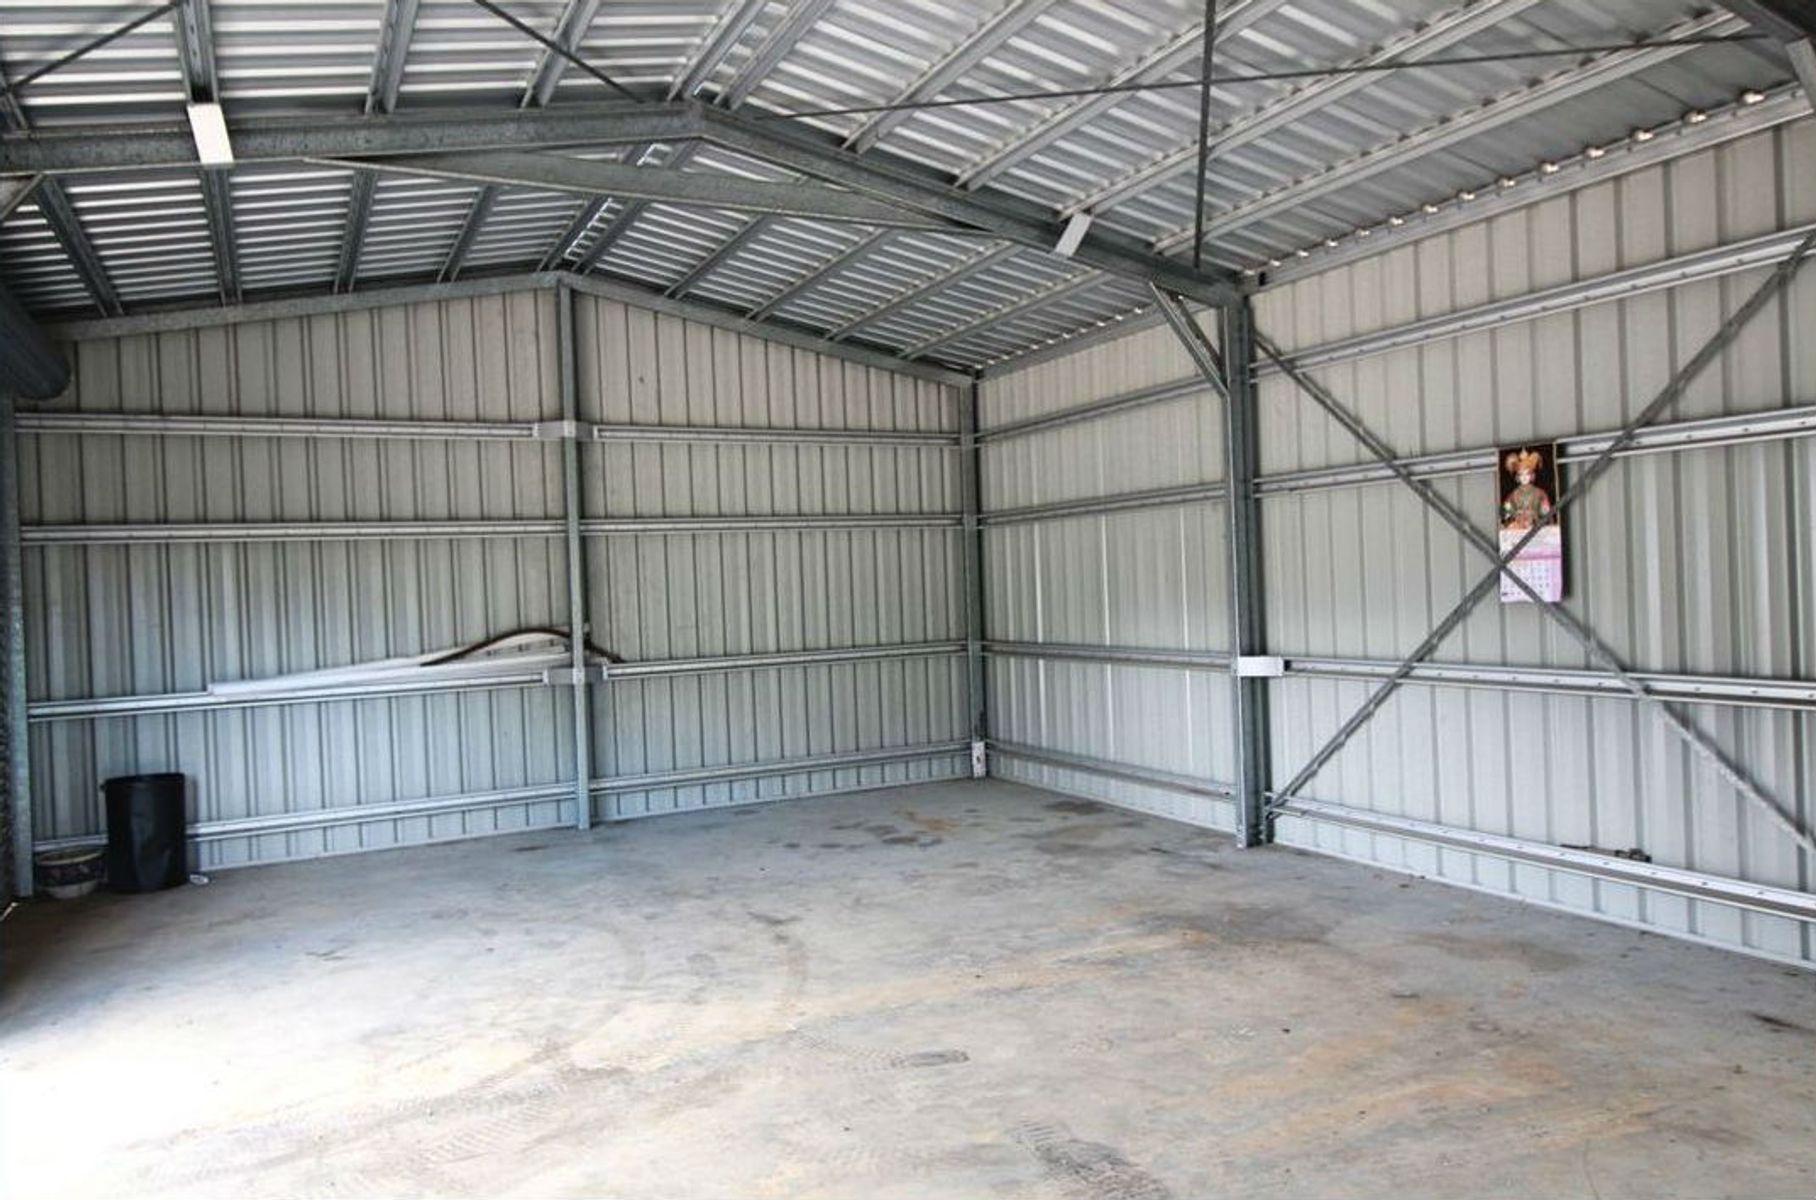 325 South Bucca Road, Bucca, QLD 4670